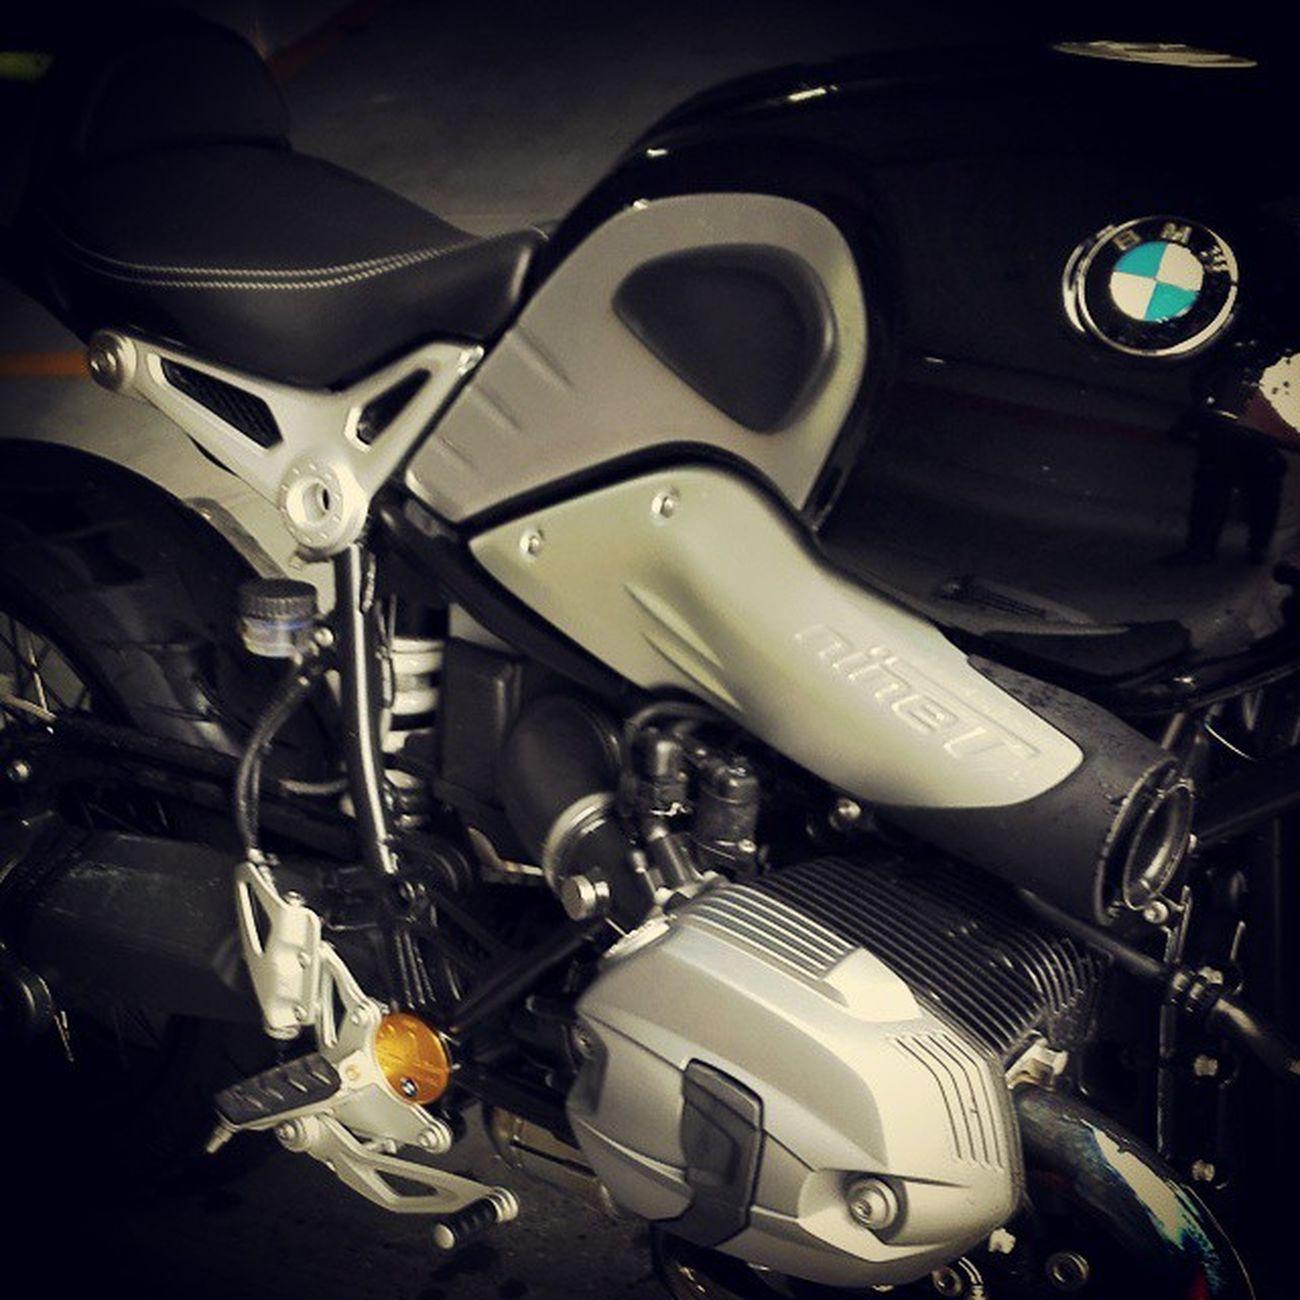 90JahreBMWmotorrad R9t Rninet Ninet Bmwninet BMWMotorrad Bmwmotorradpt